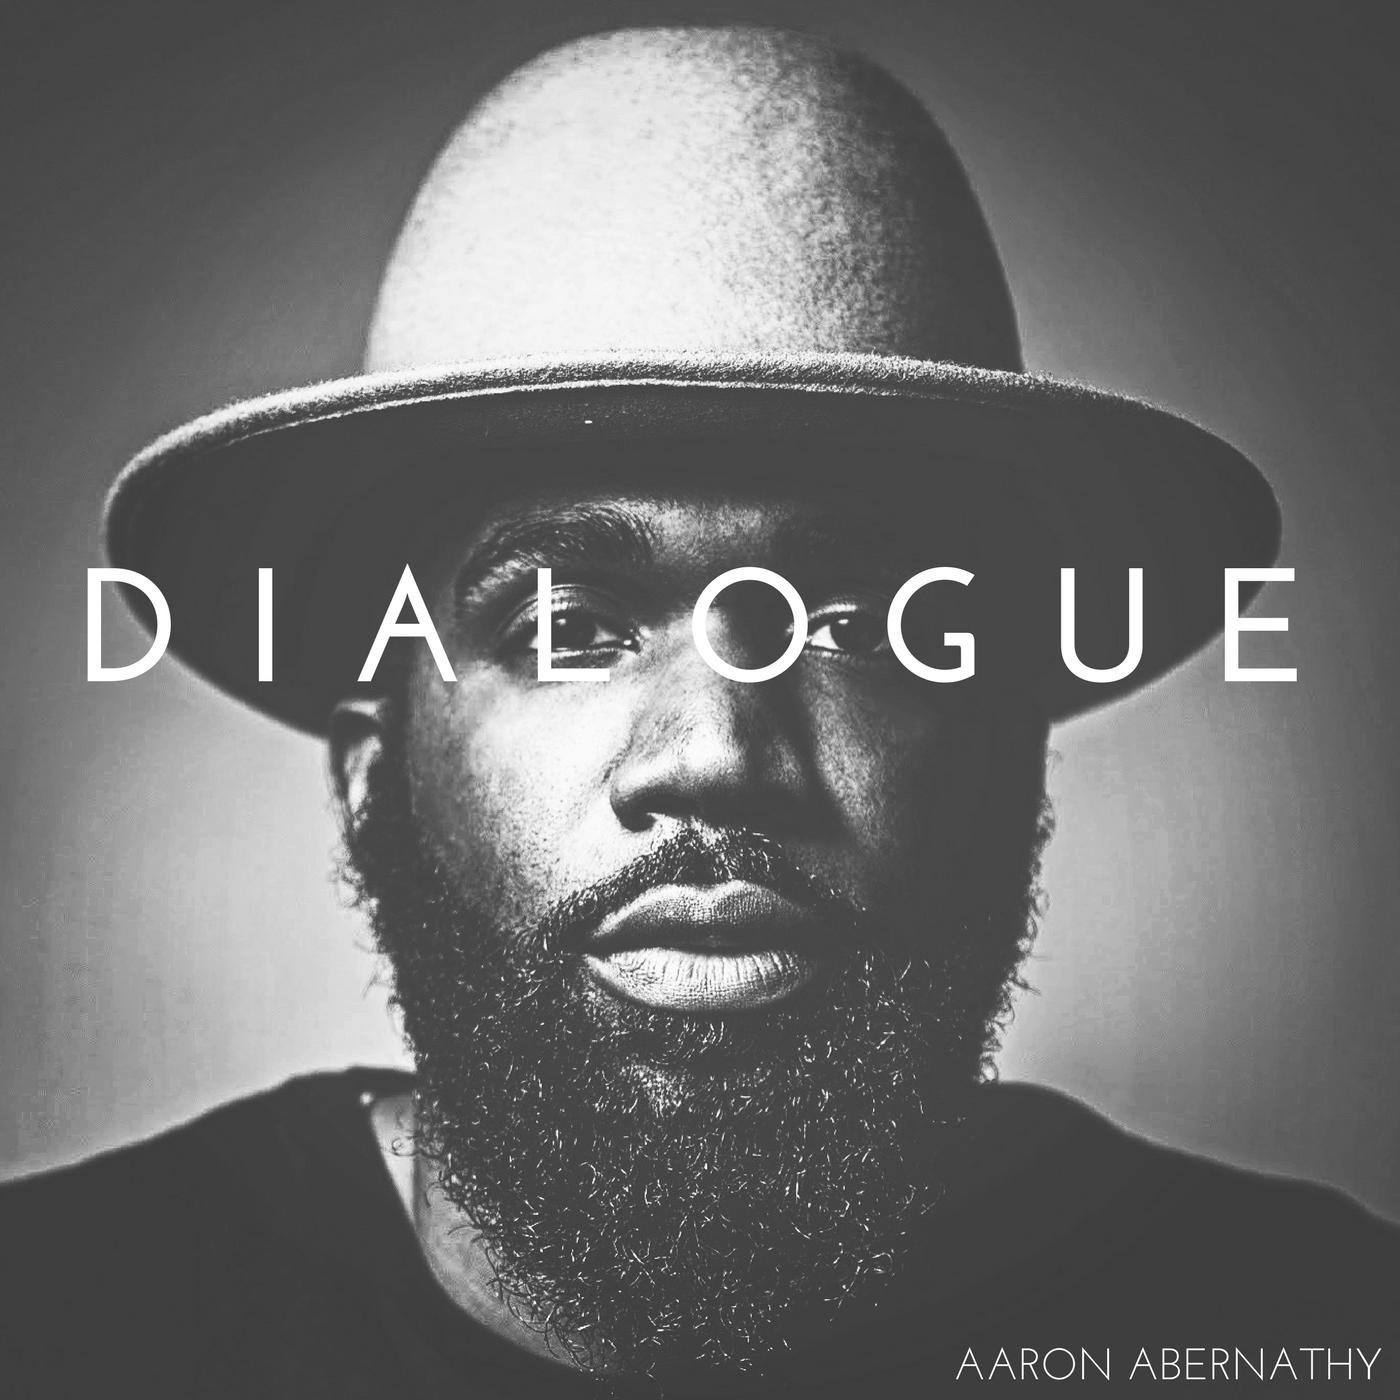 DIALOGUE LP FRONT COVER.png